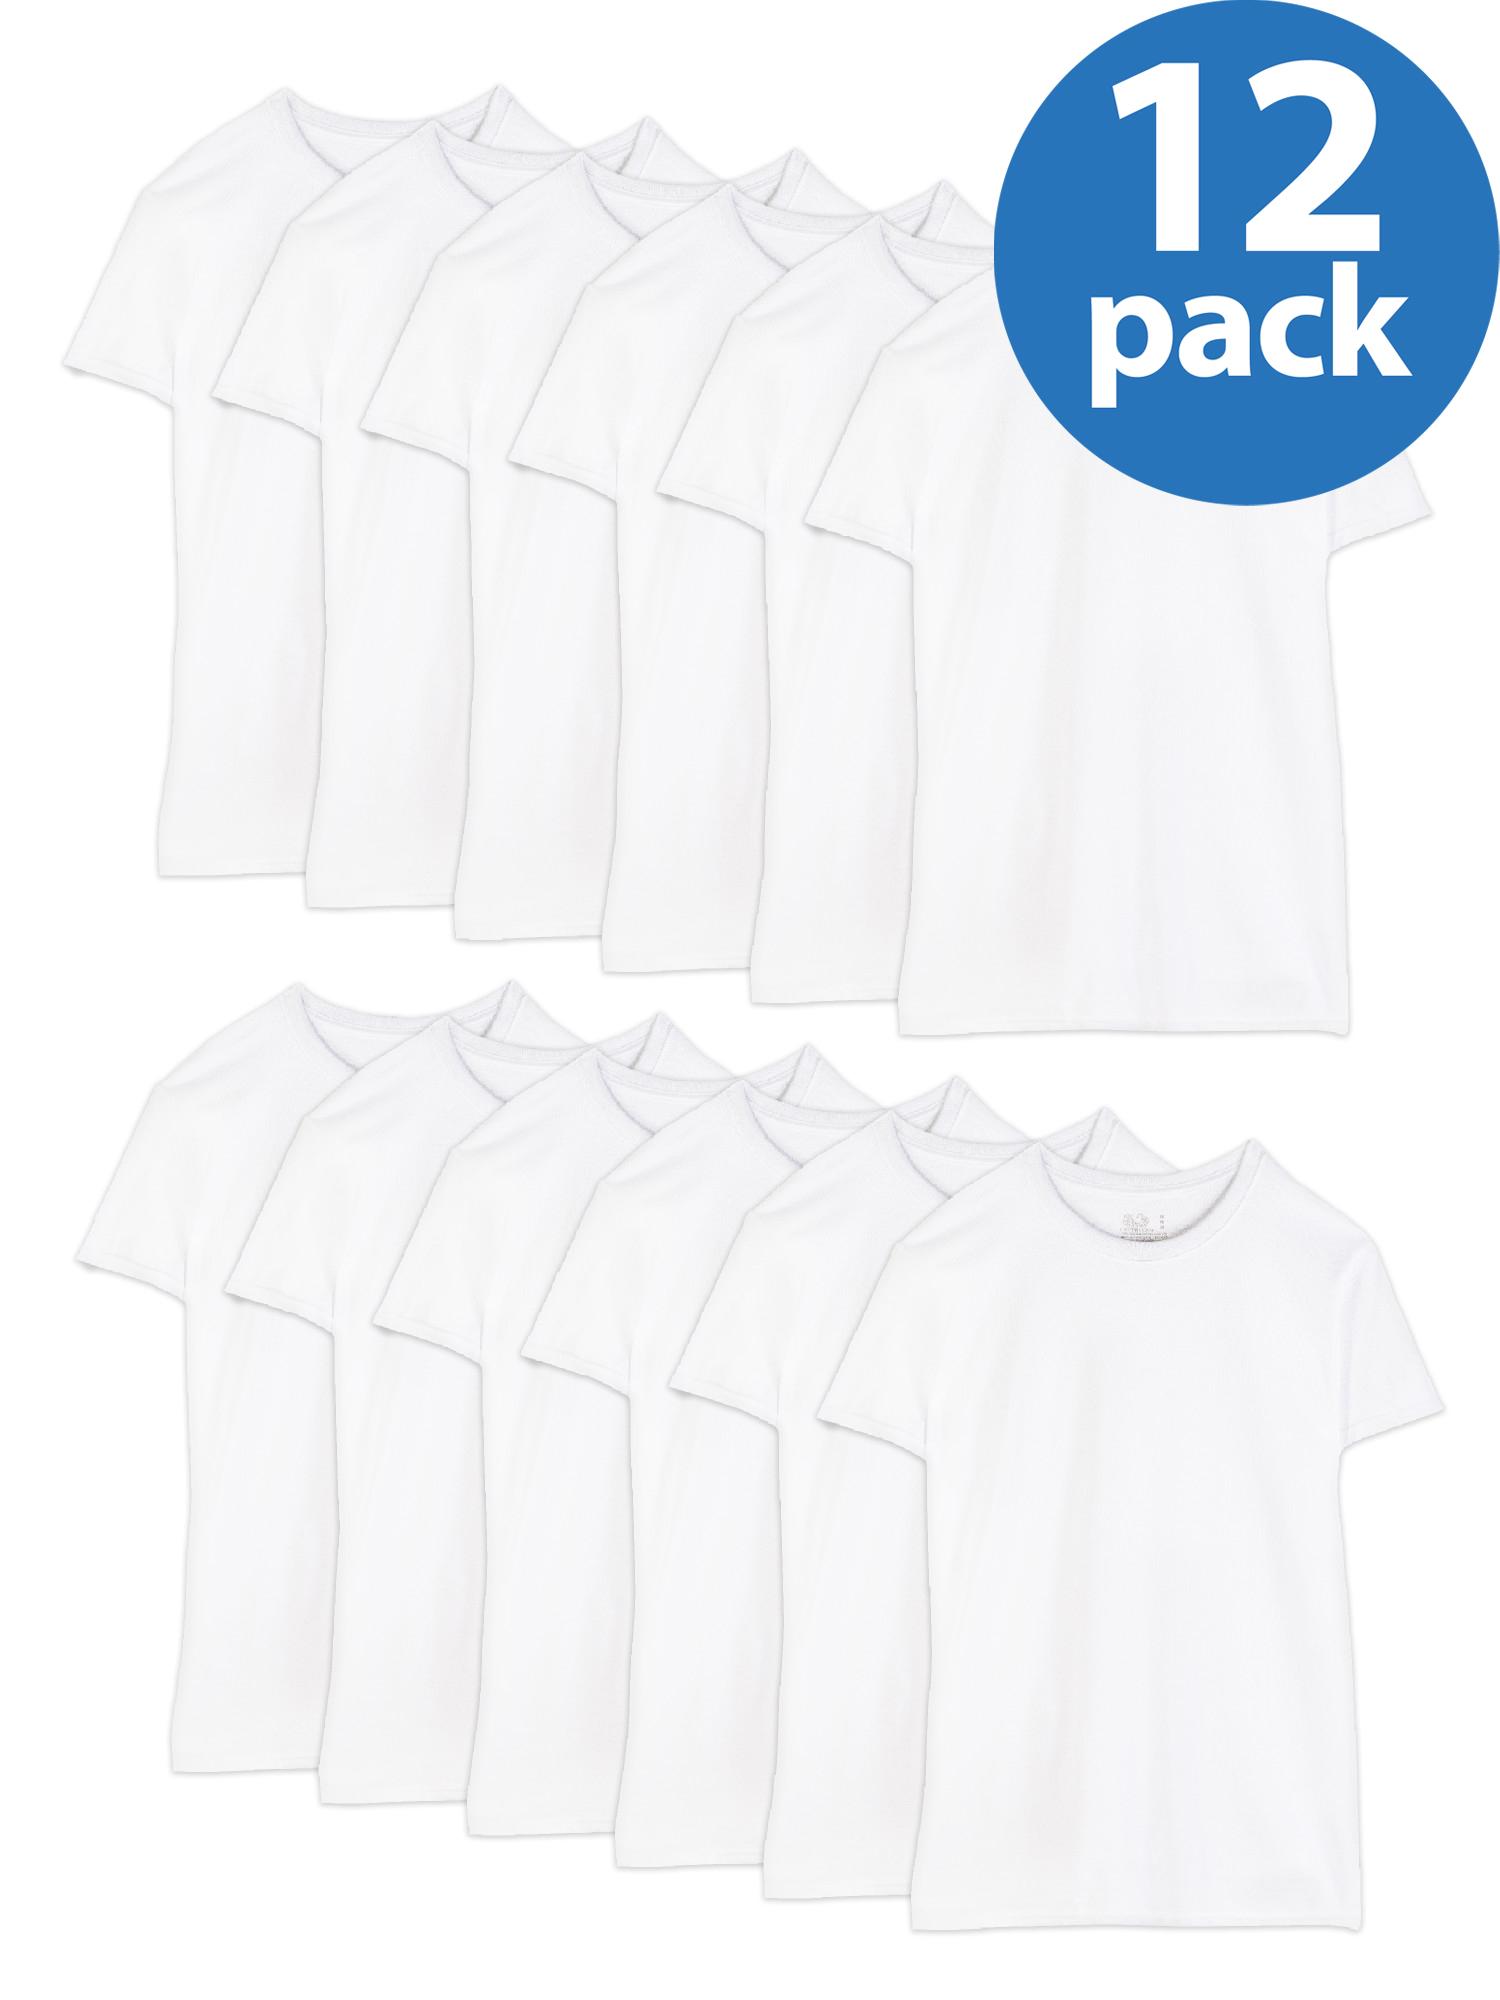 Men's Dual Defense White Crew T-Shirts, 12 Pack